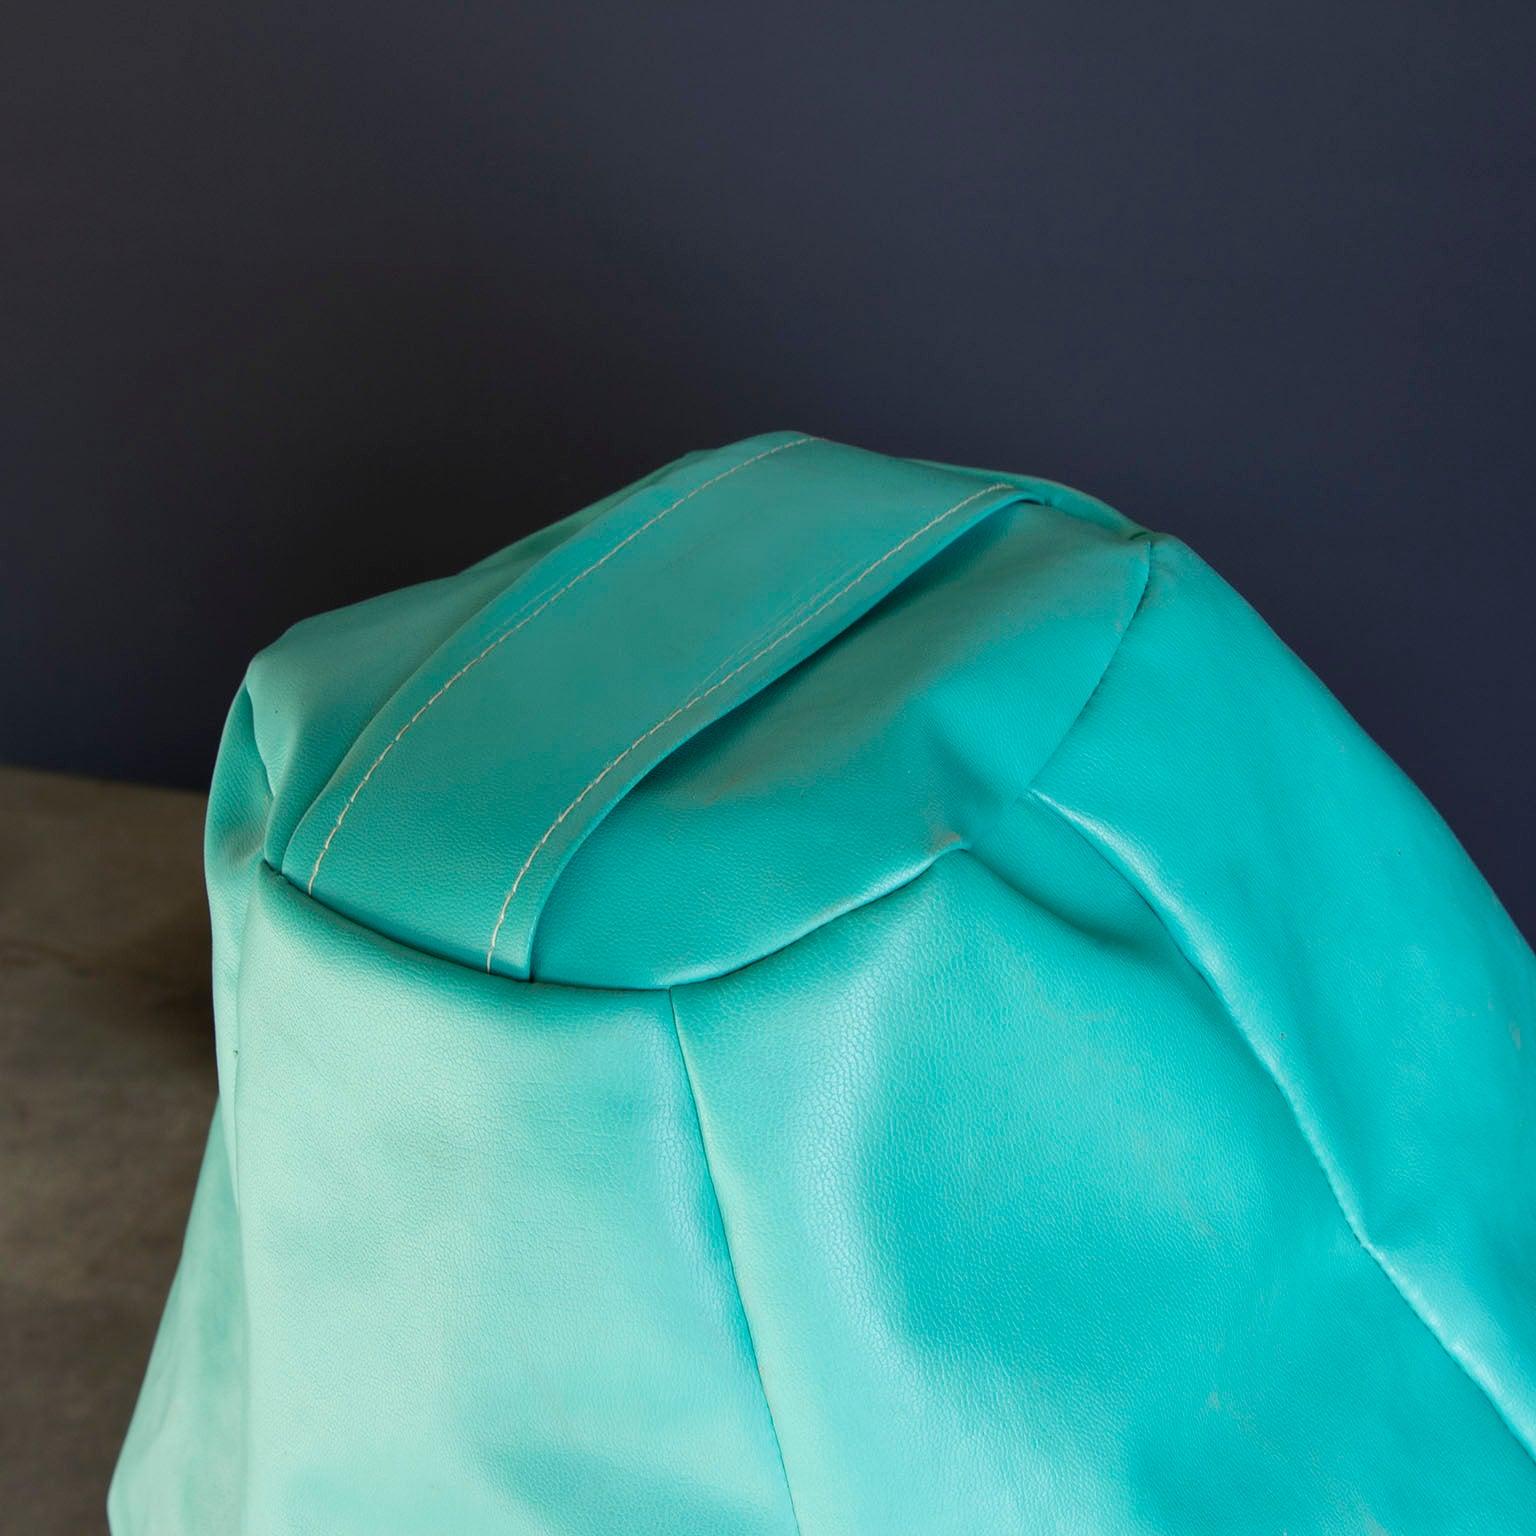 Dutch Decor Zitzak.1968 Piero Gatti Beanbag Sacco In Turquoise For Sale At 1stdibs